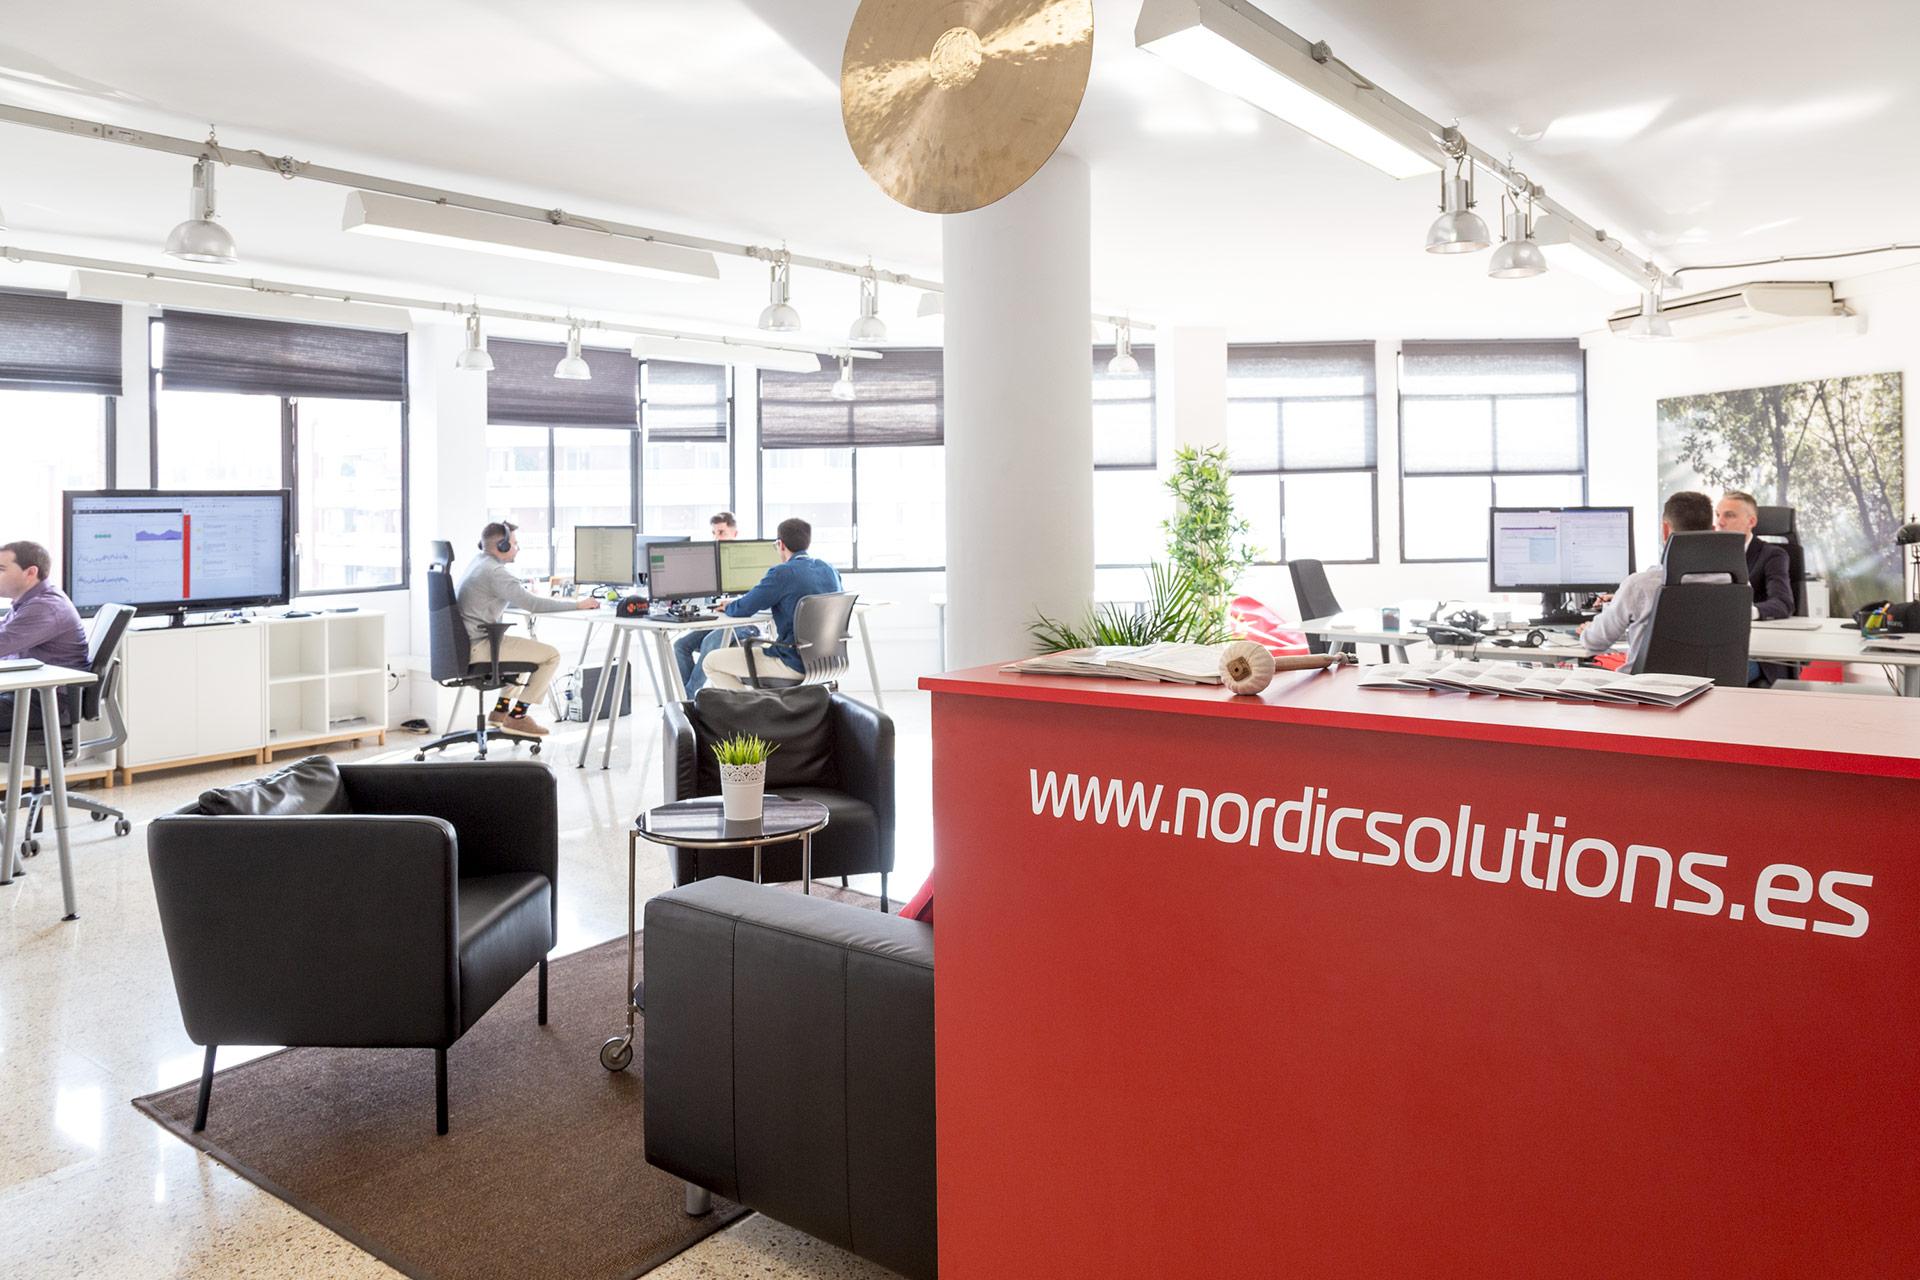 nordic-solutions-7039.jpg